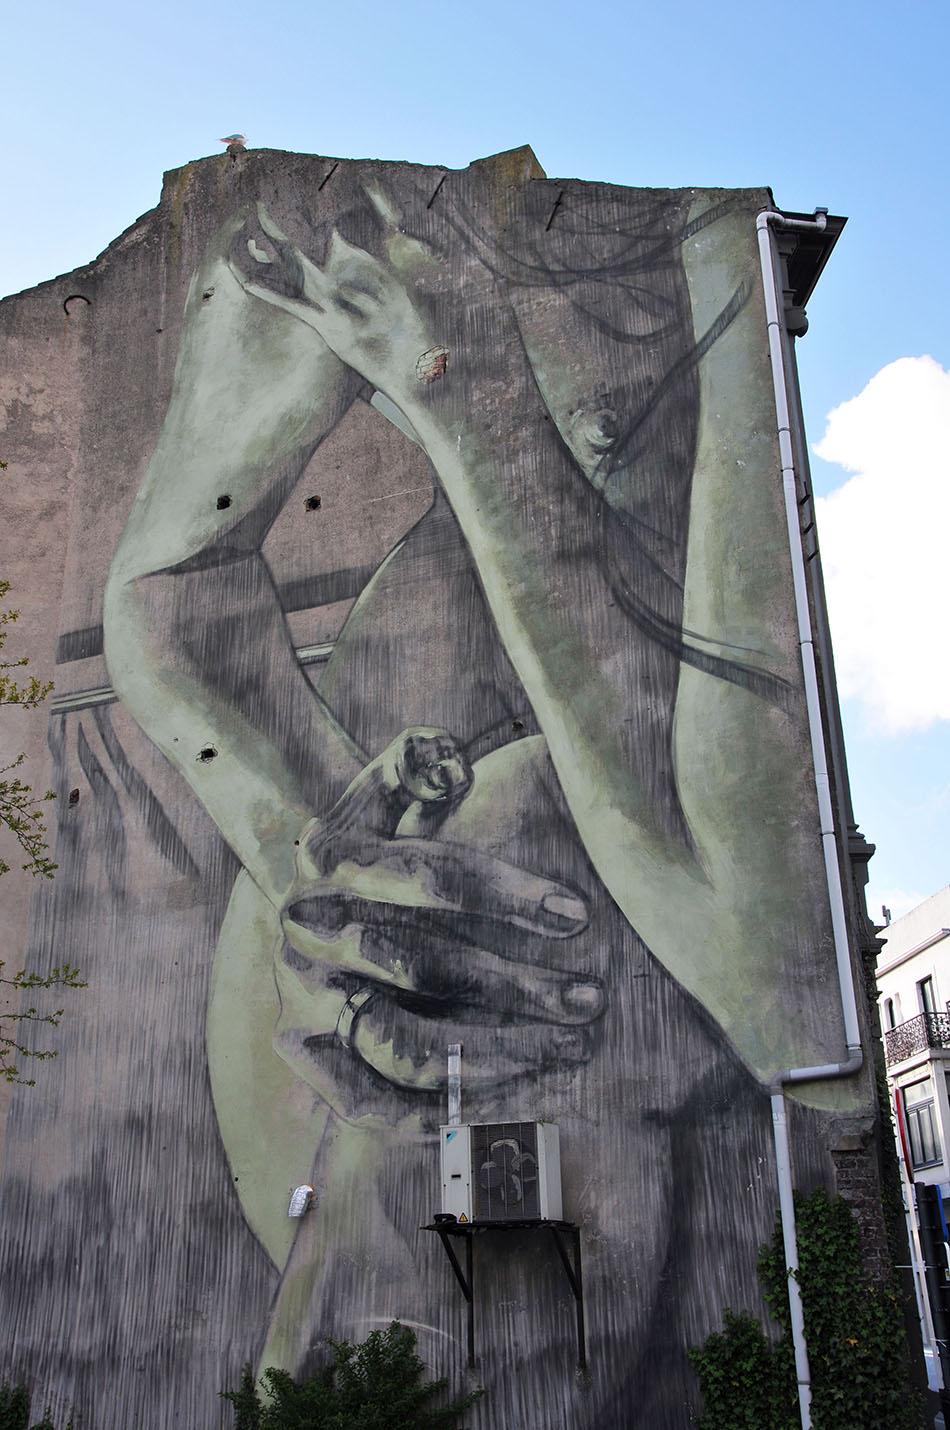 festival street-art à Ostende: le crystal ship